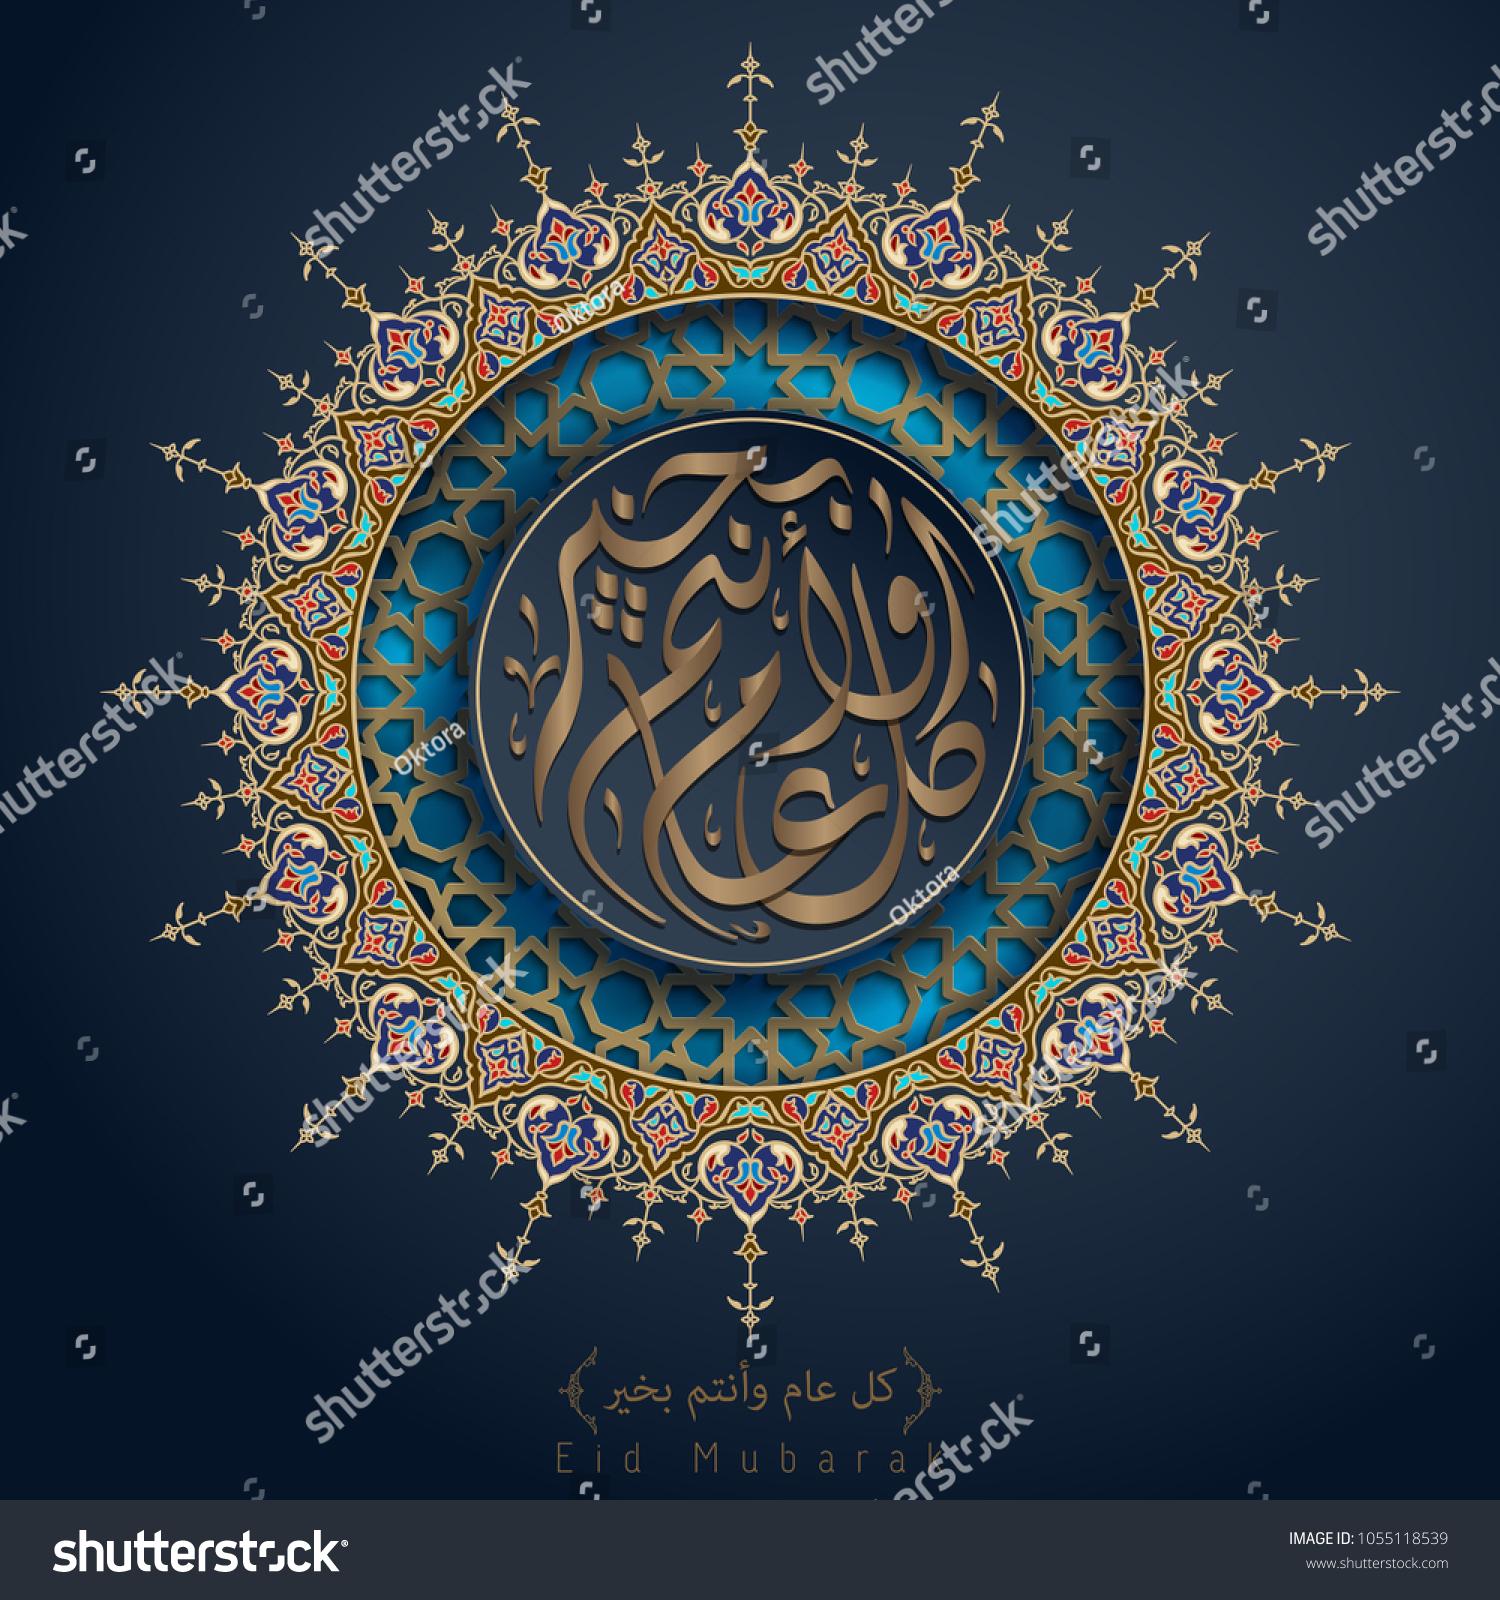 Eid Mubarak Greeting Arabic Calligraphy Floral Stock Vector Royalty